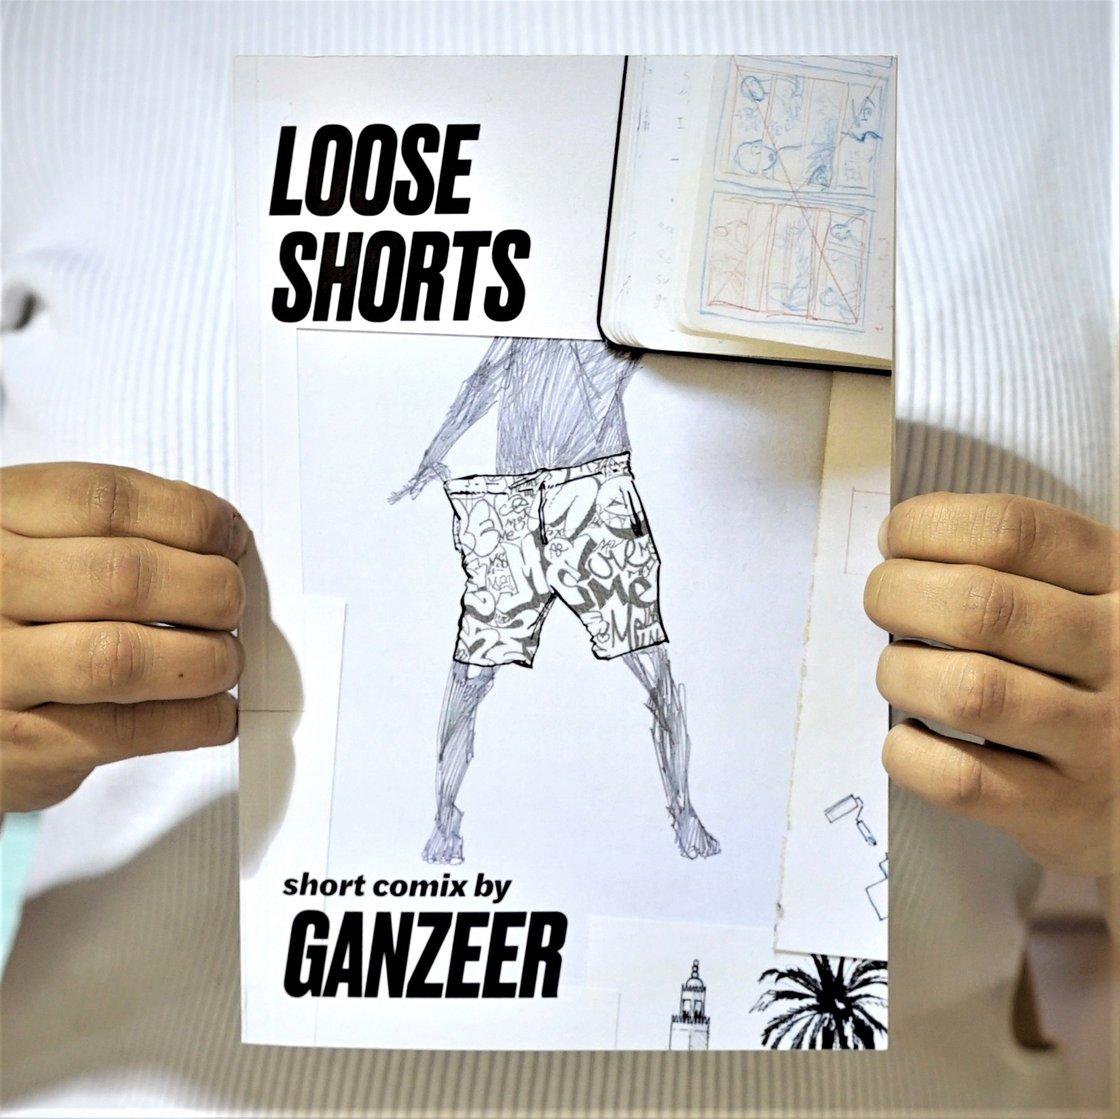 Image of Loose Shorts